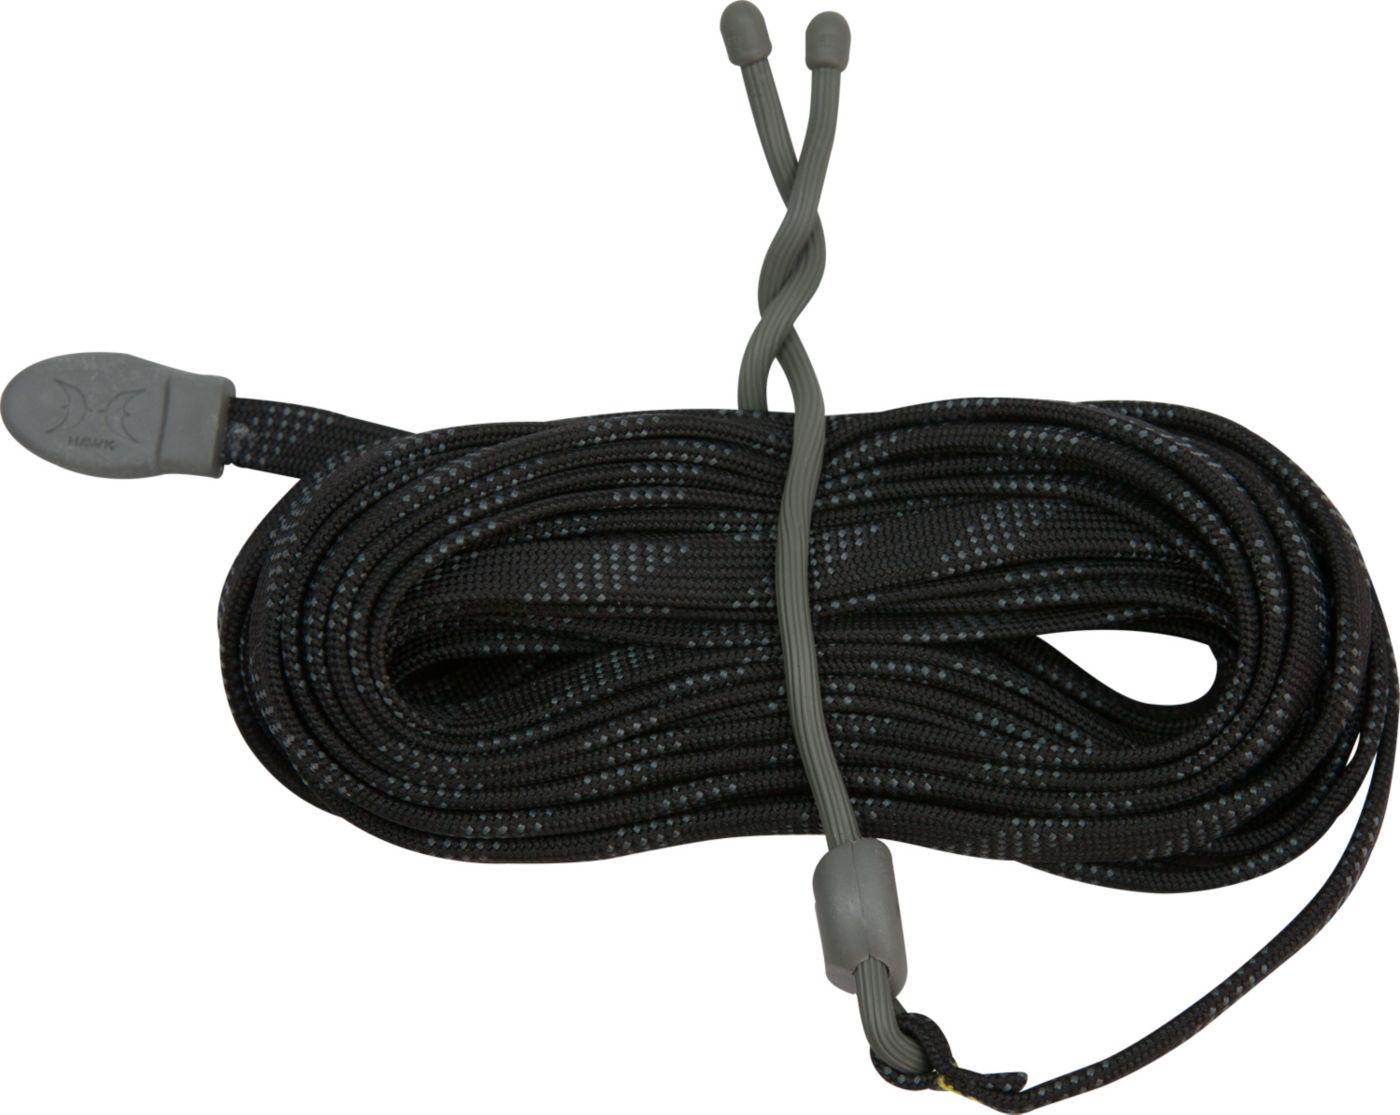 HAWK Twist-Up 25' Hoist Line